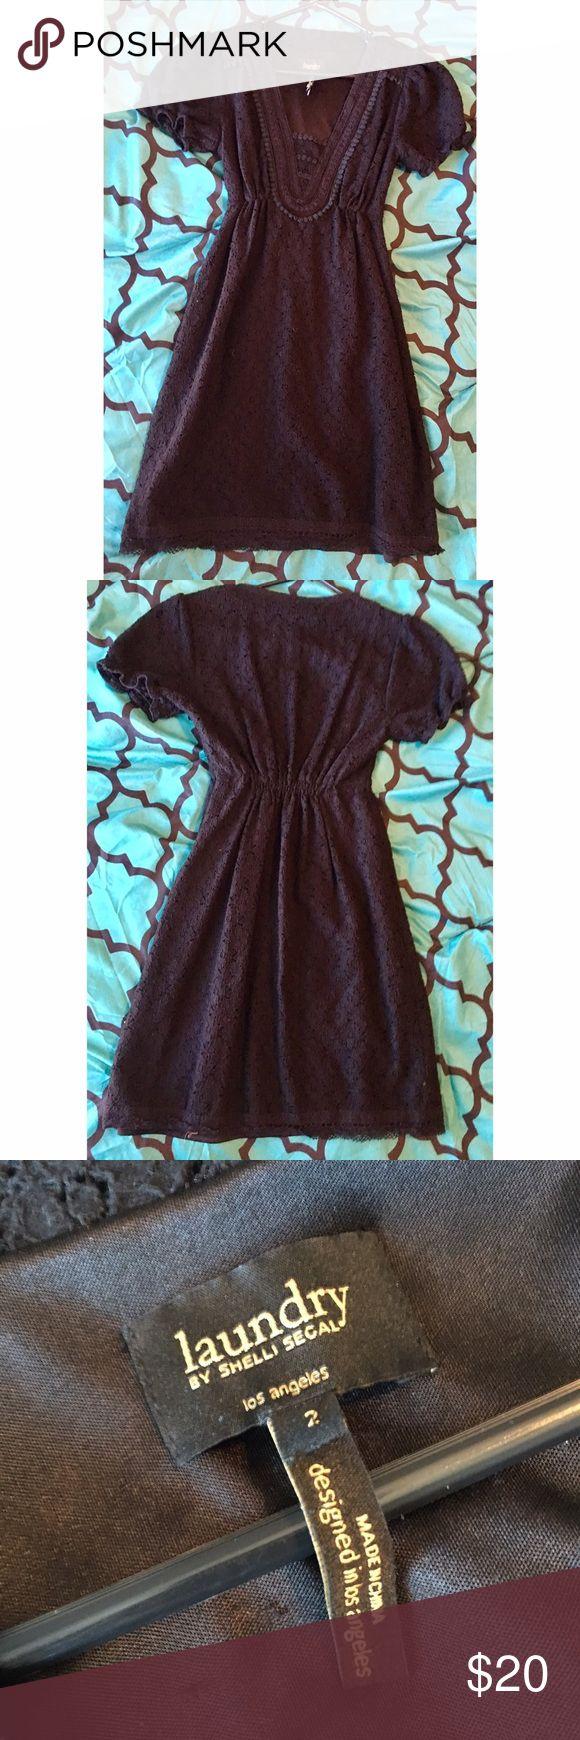 Laundry by shelli segal black dress Cute little black eyelet dress by Laundry by Shelli Segal size 2 Laundry by Shelli Segal Dresses